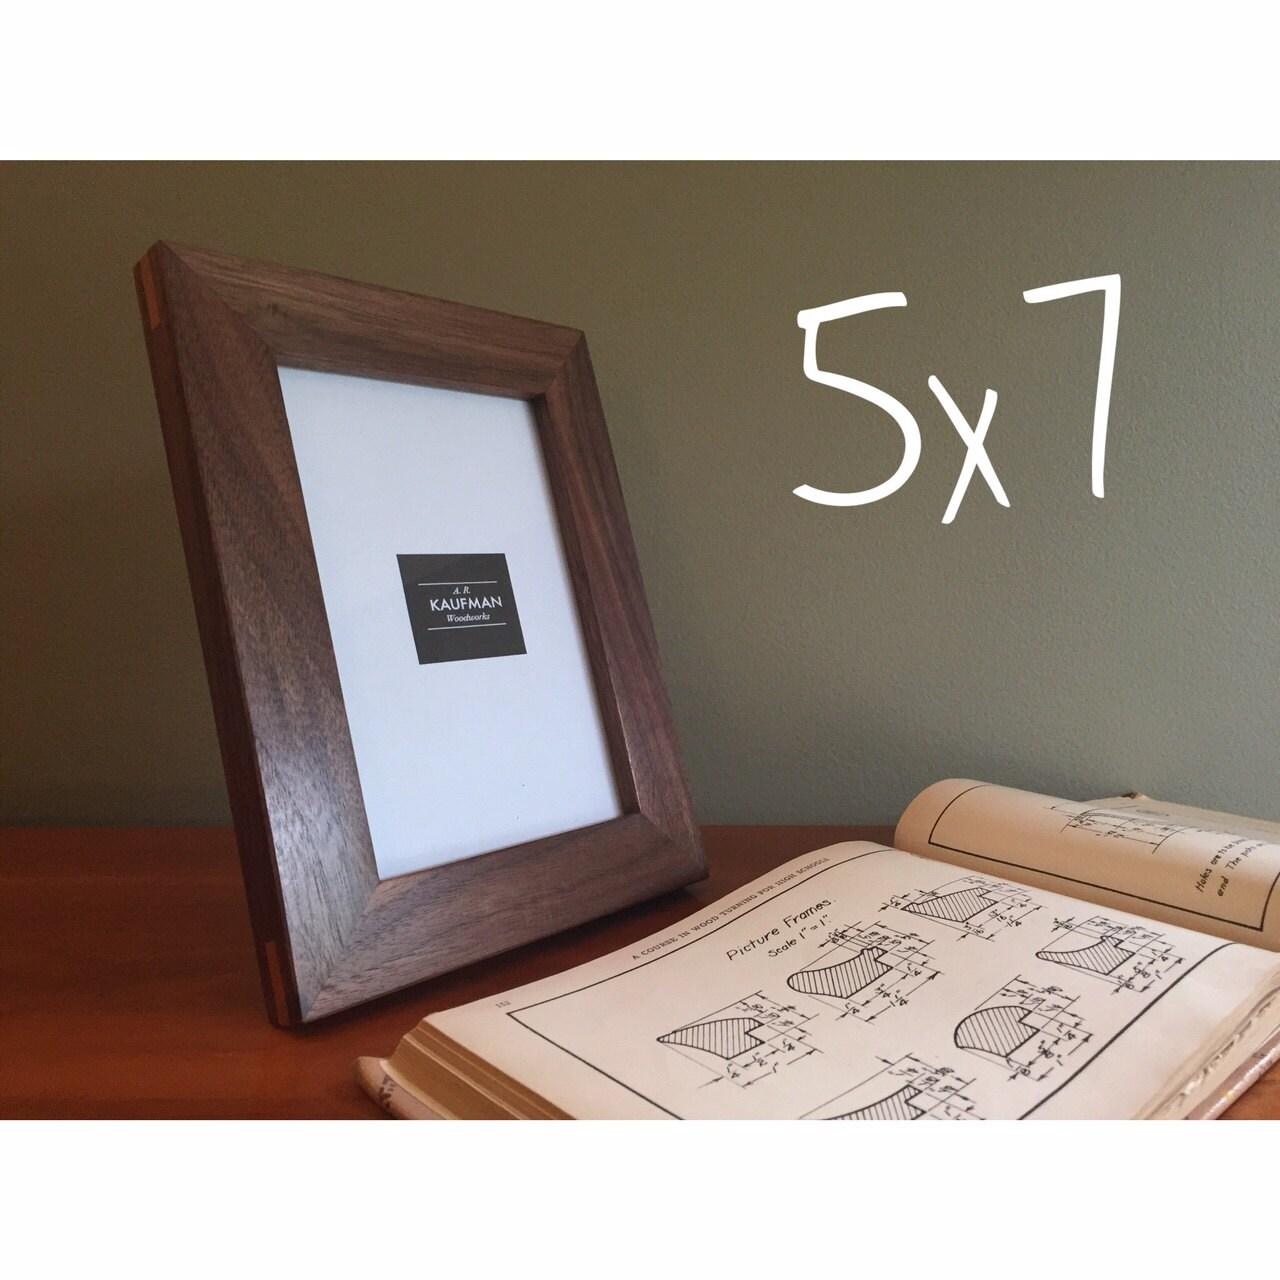 5 x 7 Holz Bilderrahmen Walnussholz mit Kirsche Splines   Etsy